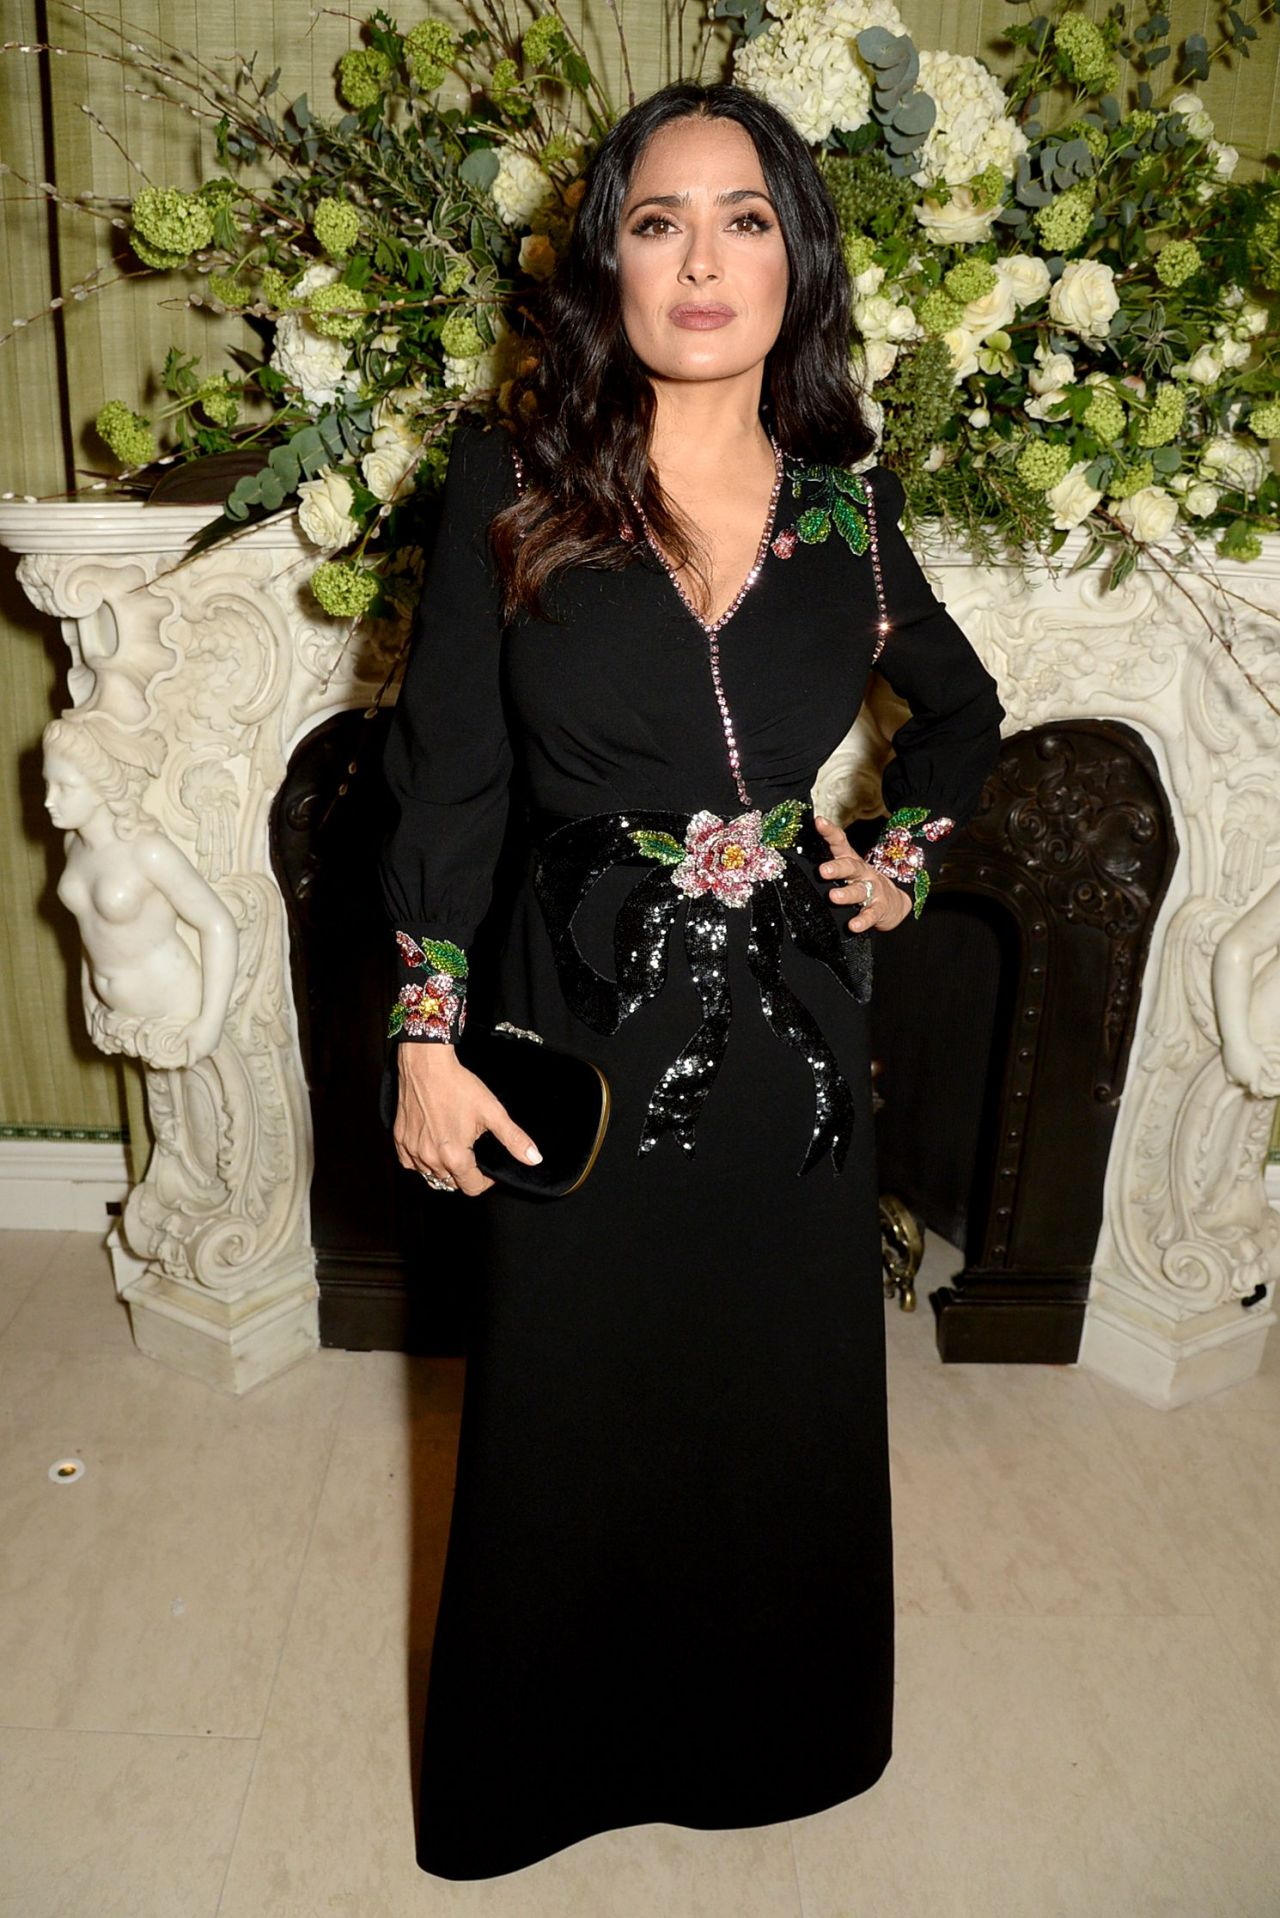 http://celebmafia.com/wp-content/uploads/2018/02/salma-hayek-vogue-and-tiffany-co-party-in-london-1.jpg